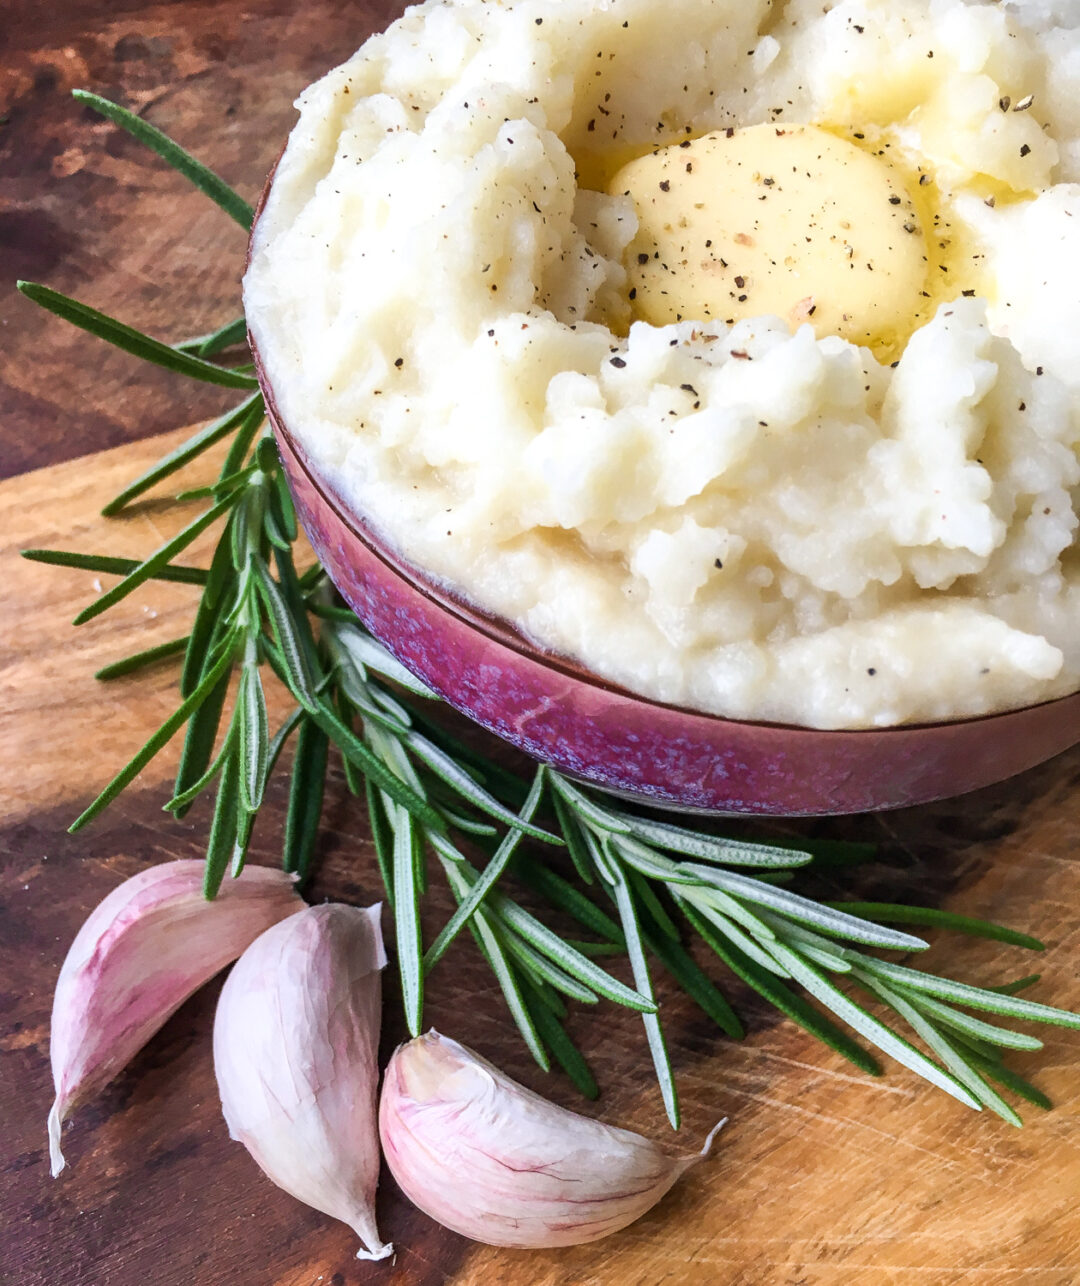 Instant Pot Rosemary Garlic Mashed Potatoes